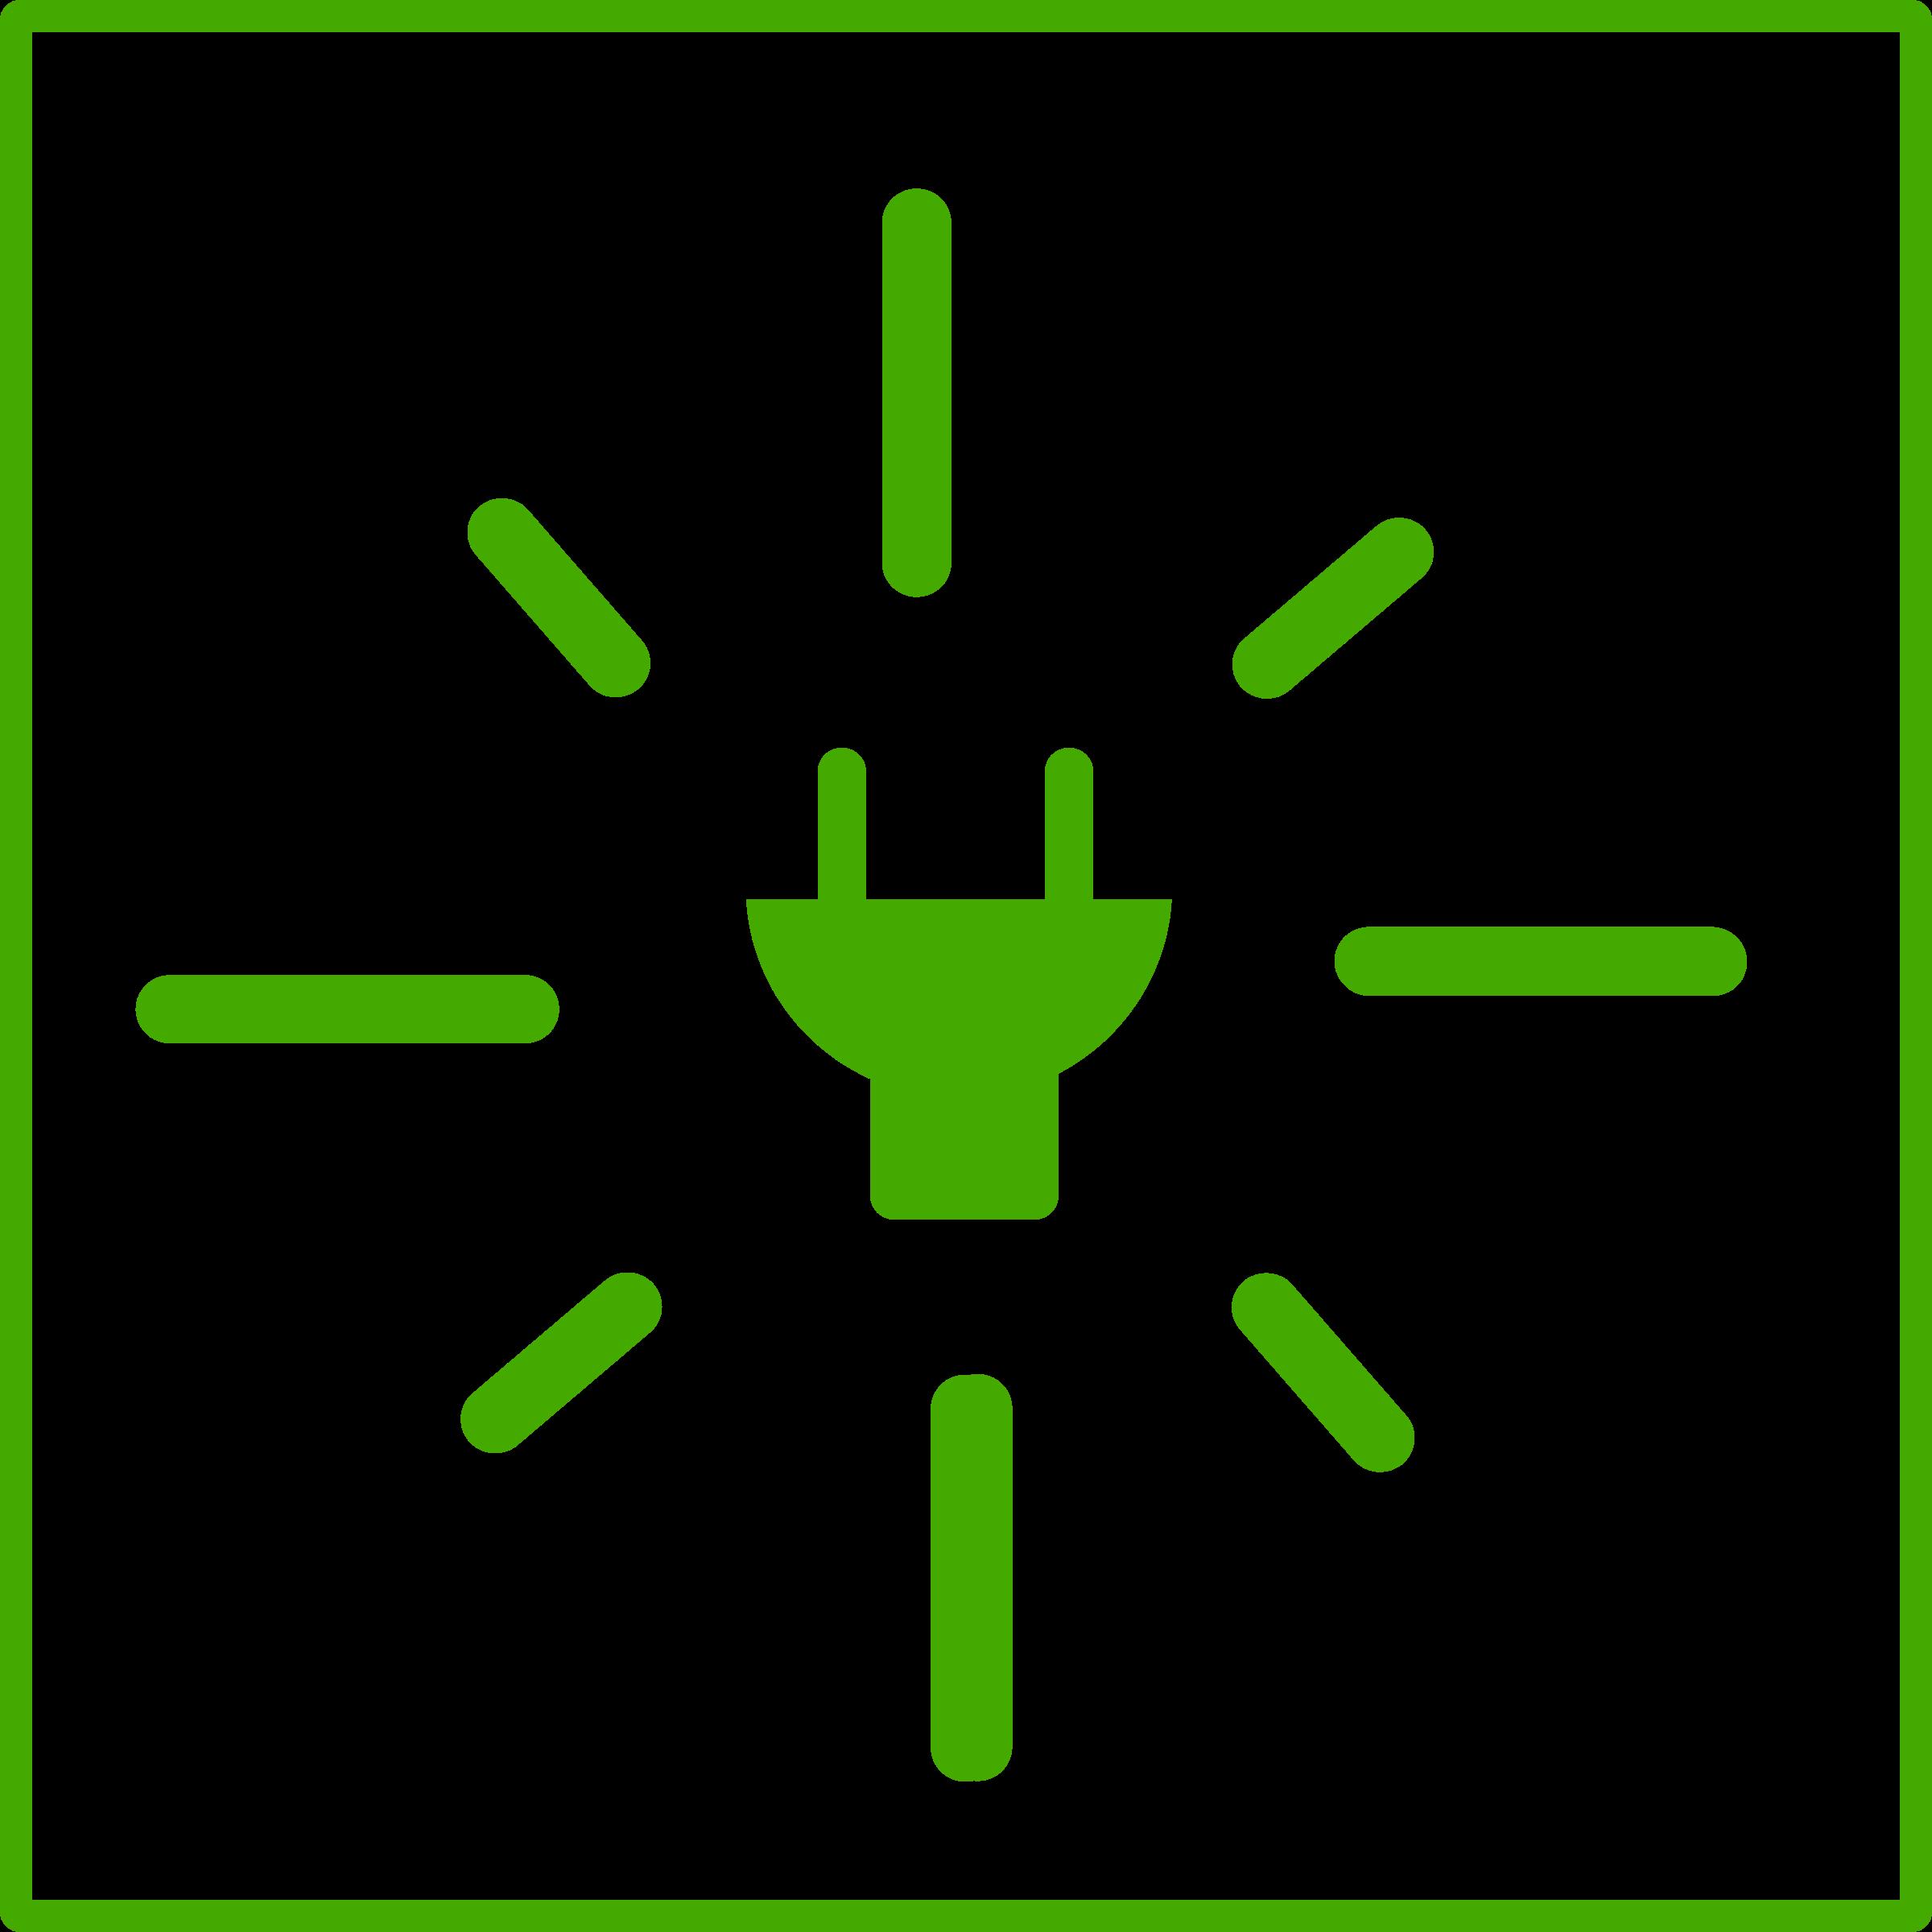 Eco green big image. Energy clipart icon